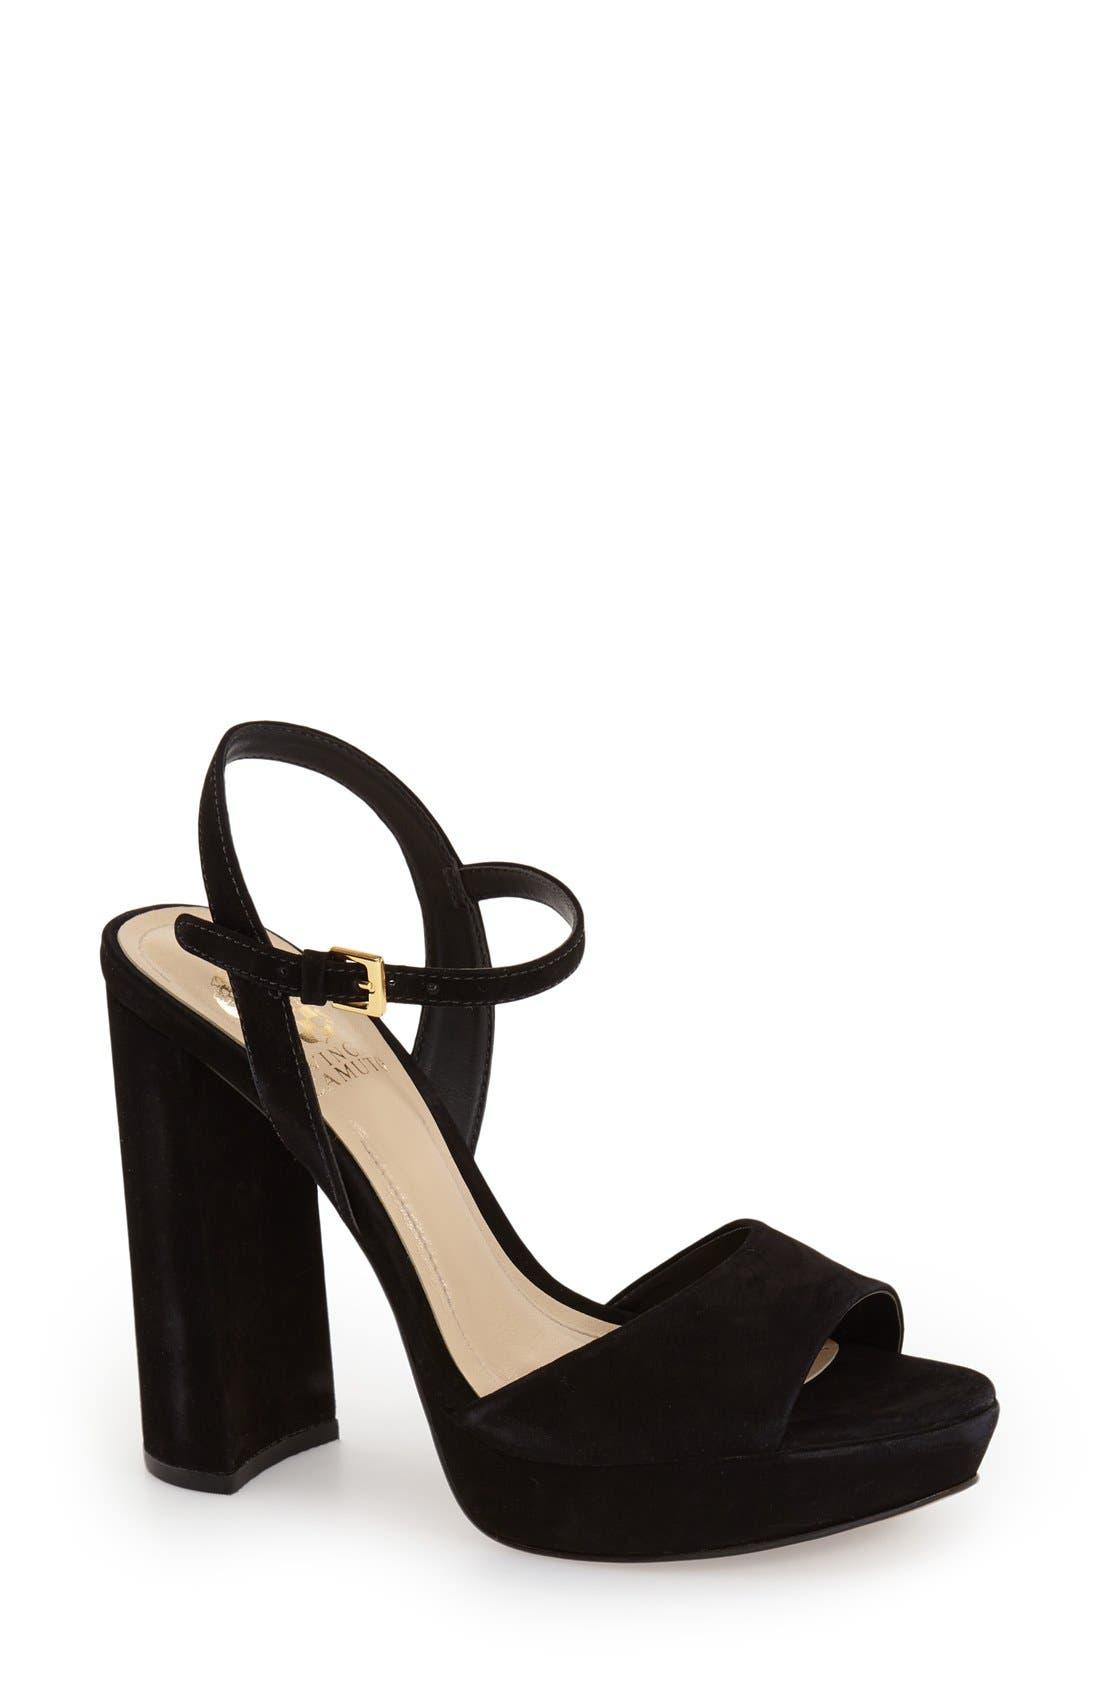 Main Image - Vince Camuto 'Krysta' Platform Sandal (Women)